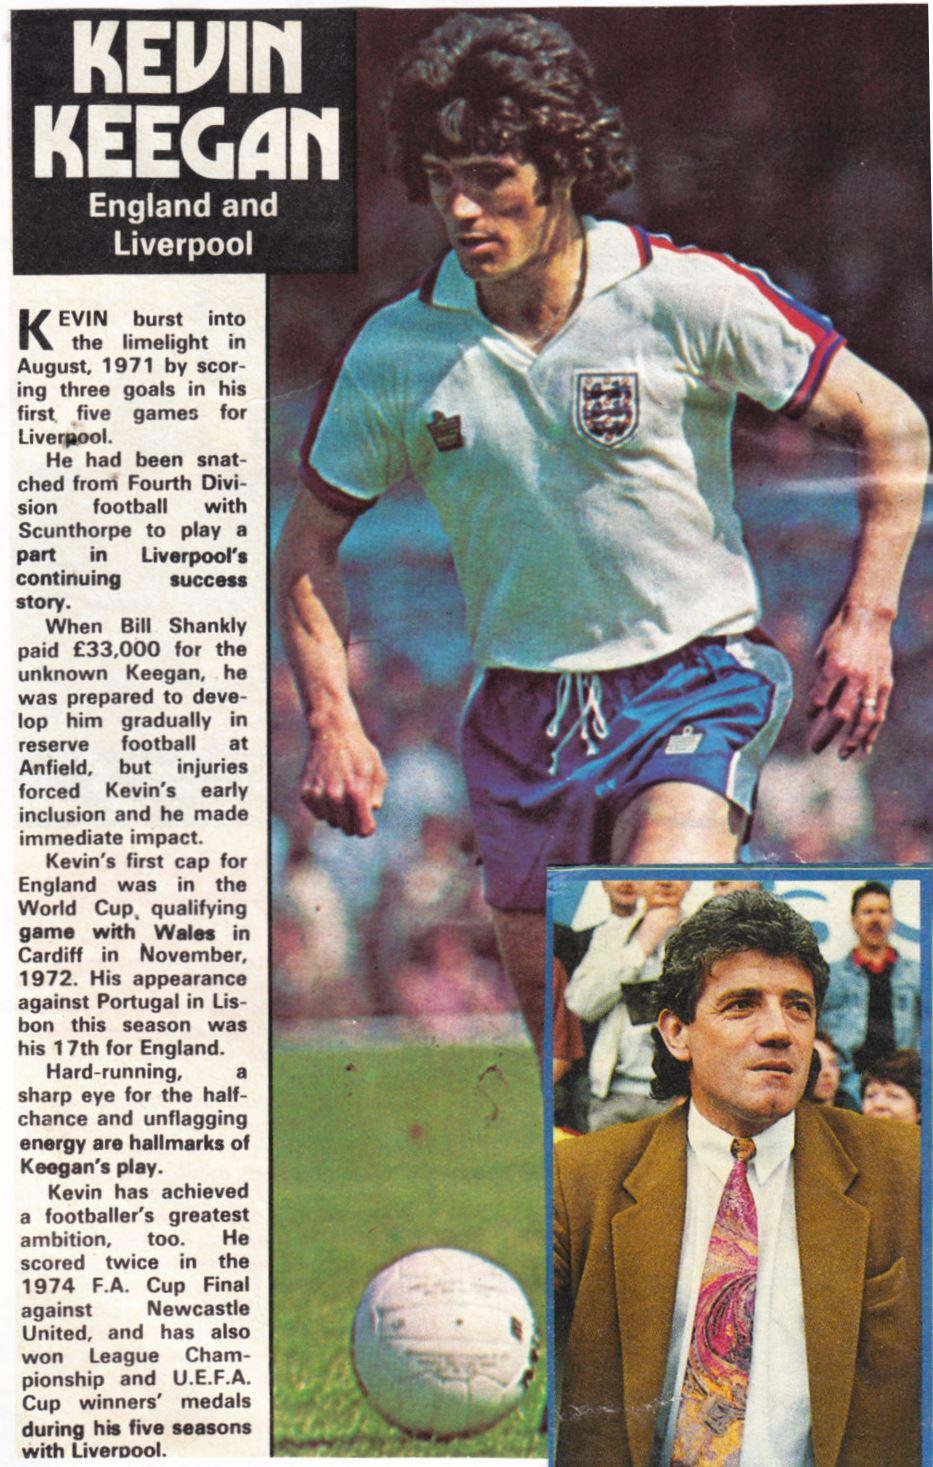 LIPTON TEA-FOOTBALL KEVIN KEEGAN LIVERPOOL ENGLAND